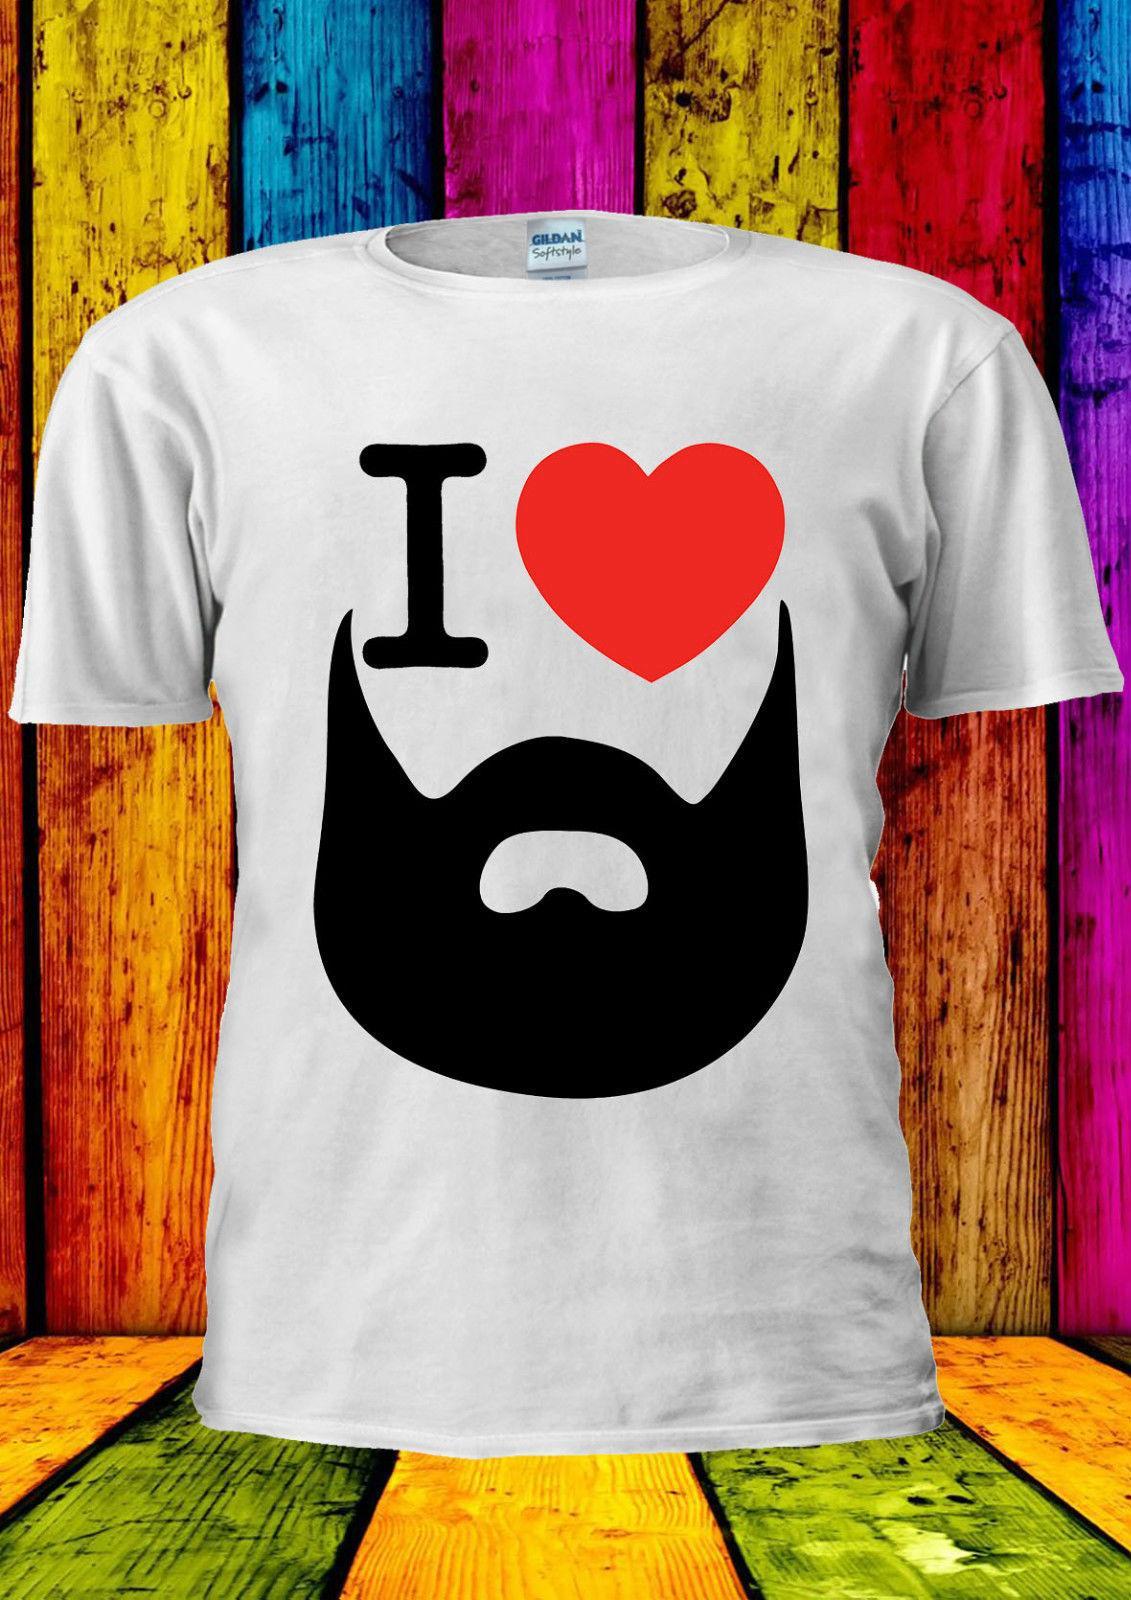 b6bbb46f6fc644 I Love My Beard Funny Tumblr T Shirt Vest Tank Top Men Women Unisex 2399  2019 Fashion T Shirt